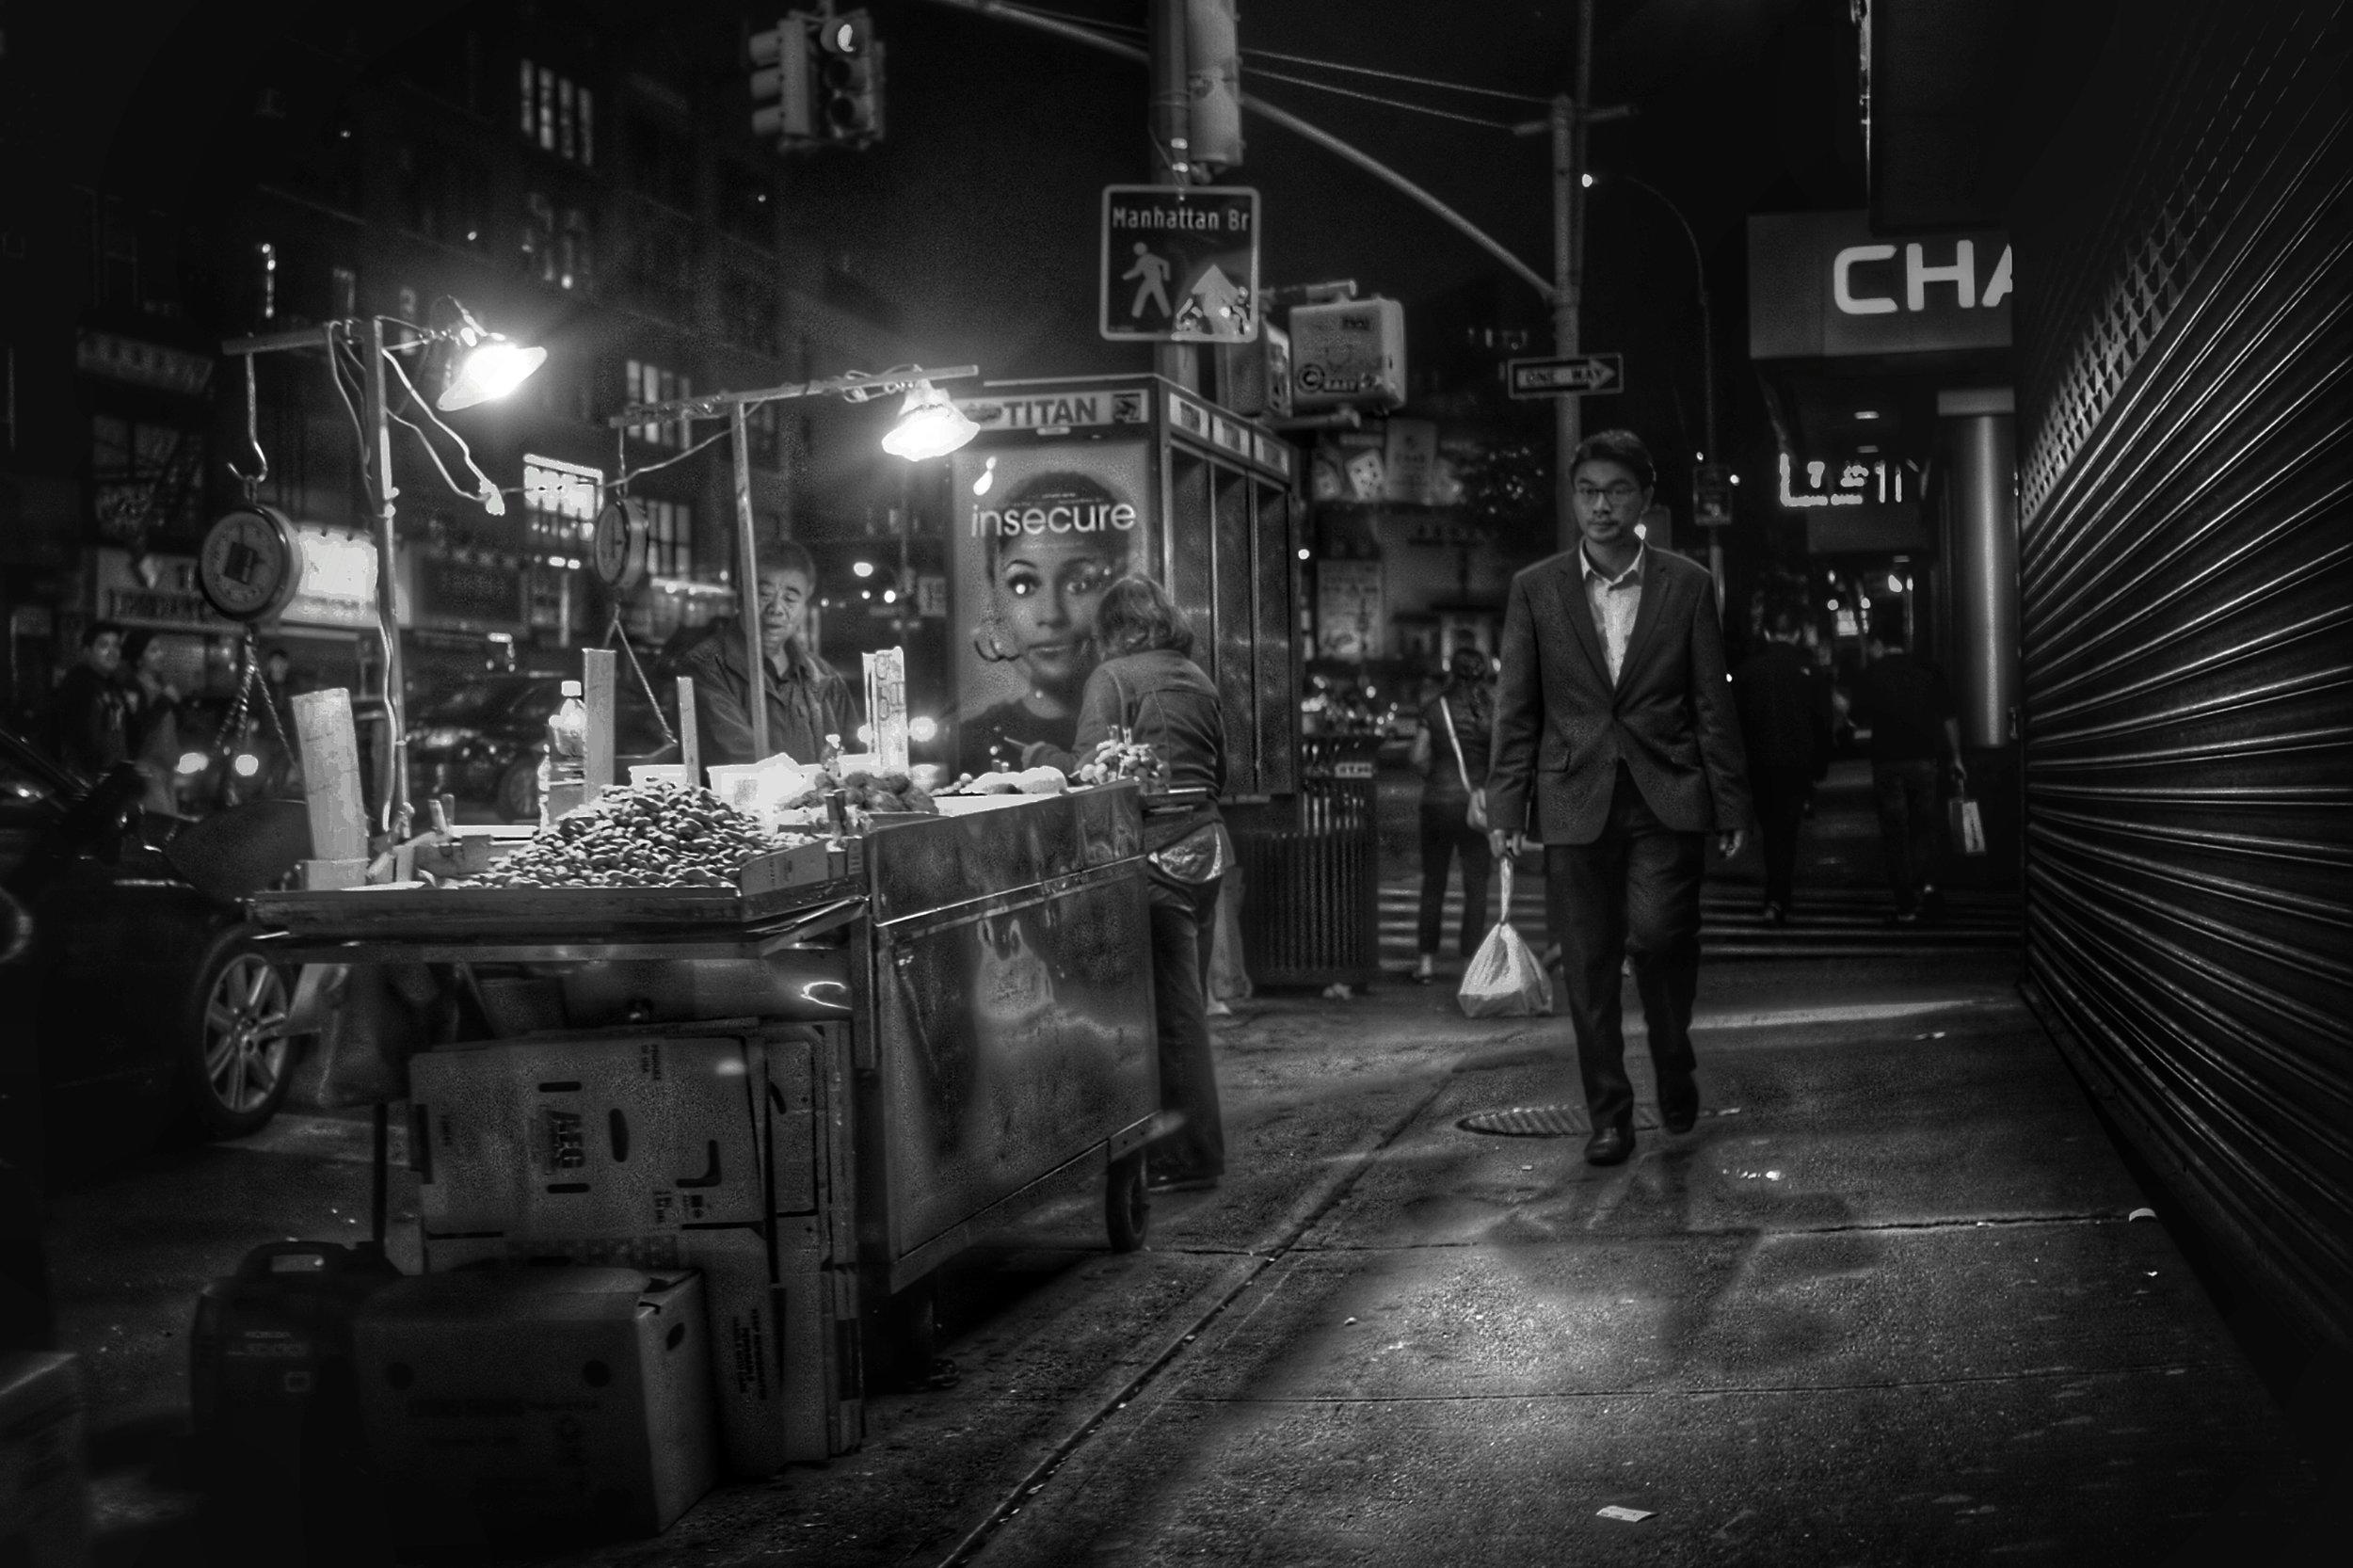 Vendor. Canal Street. New York City. 2016.